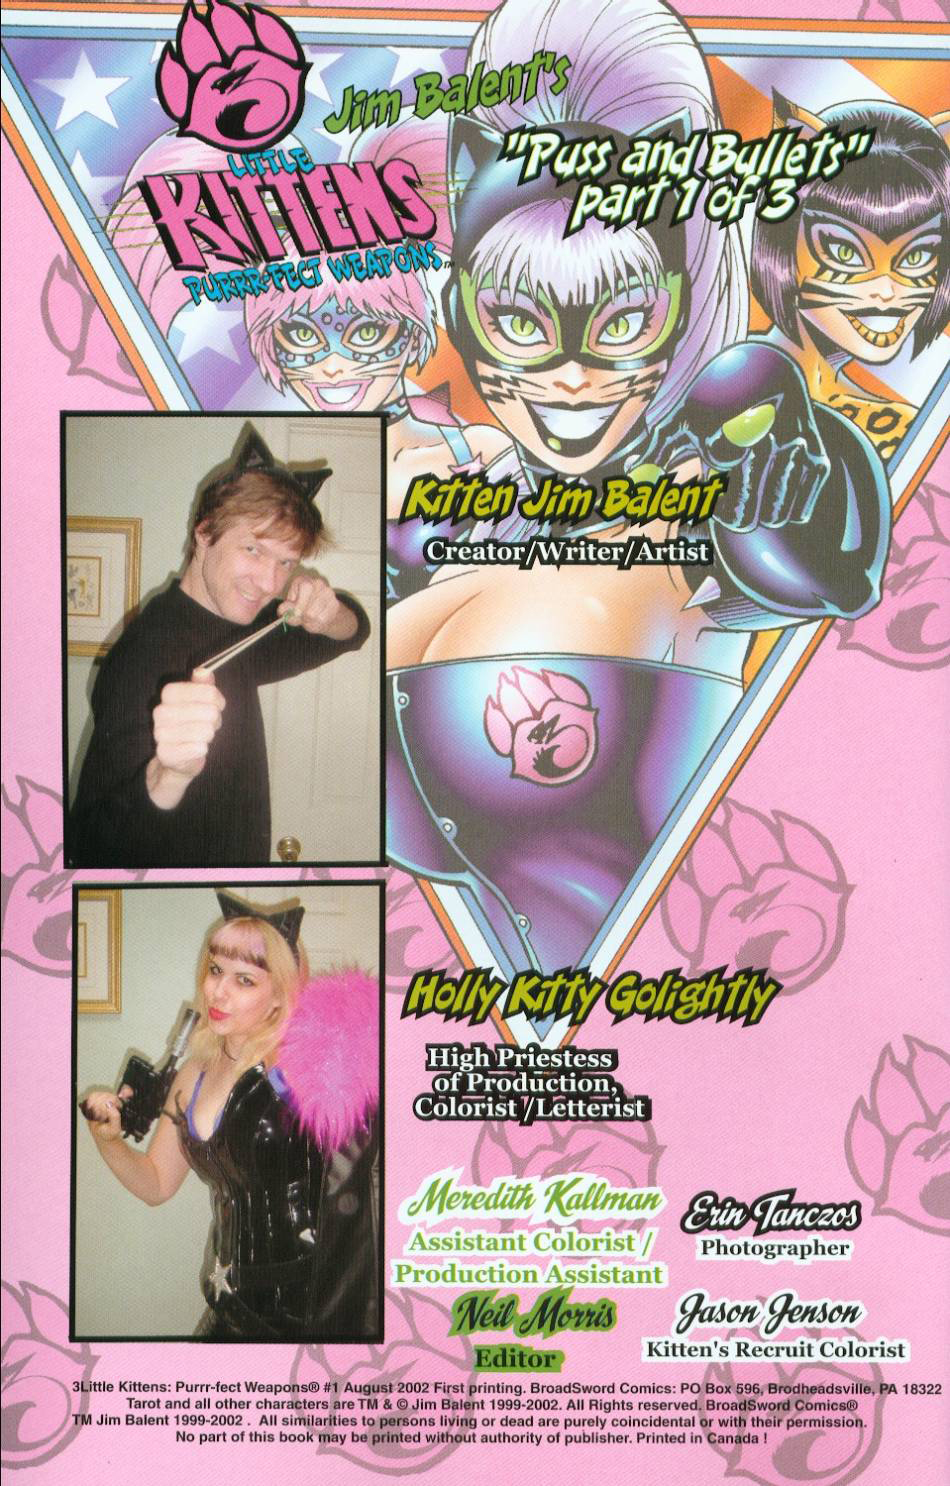 Read online 3 Little Kittens: Purrr-fect Weapons comic -  Issue #1 - 2